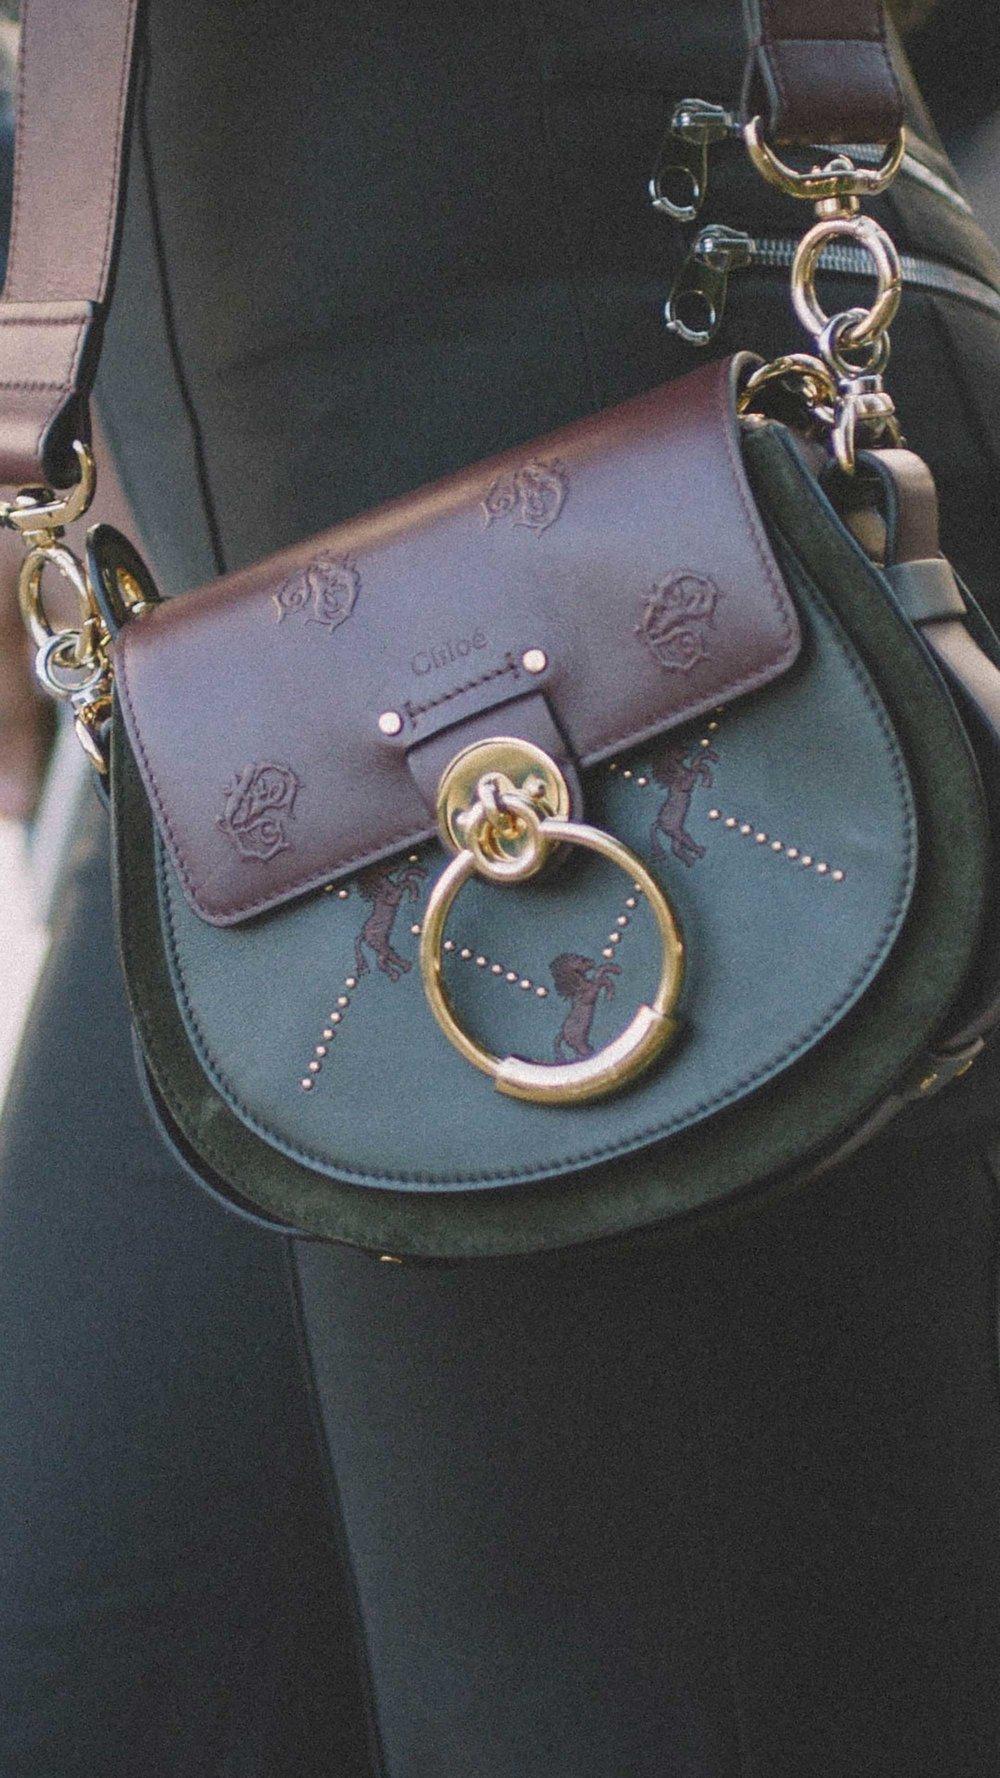 12 Best Chloe bags of Fashion Week -  CHLOe Roy mini leather bucket bag and Chloe Small Tess Leather Shoulder Bag5.jpg